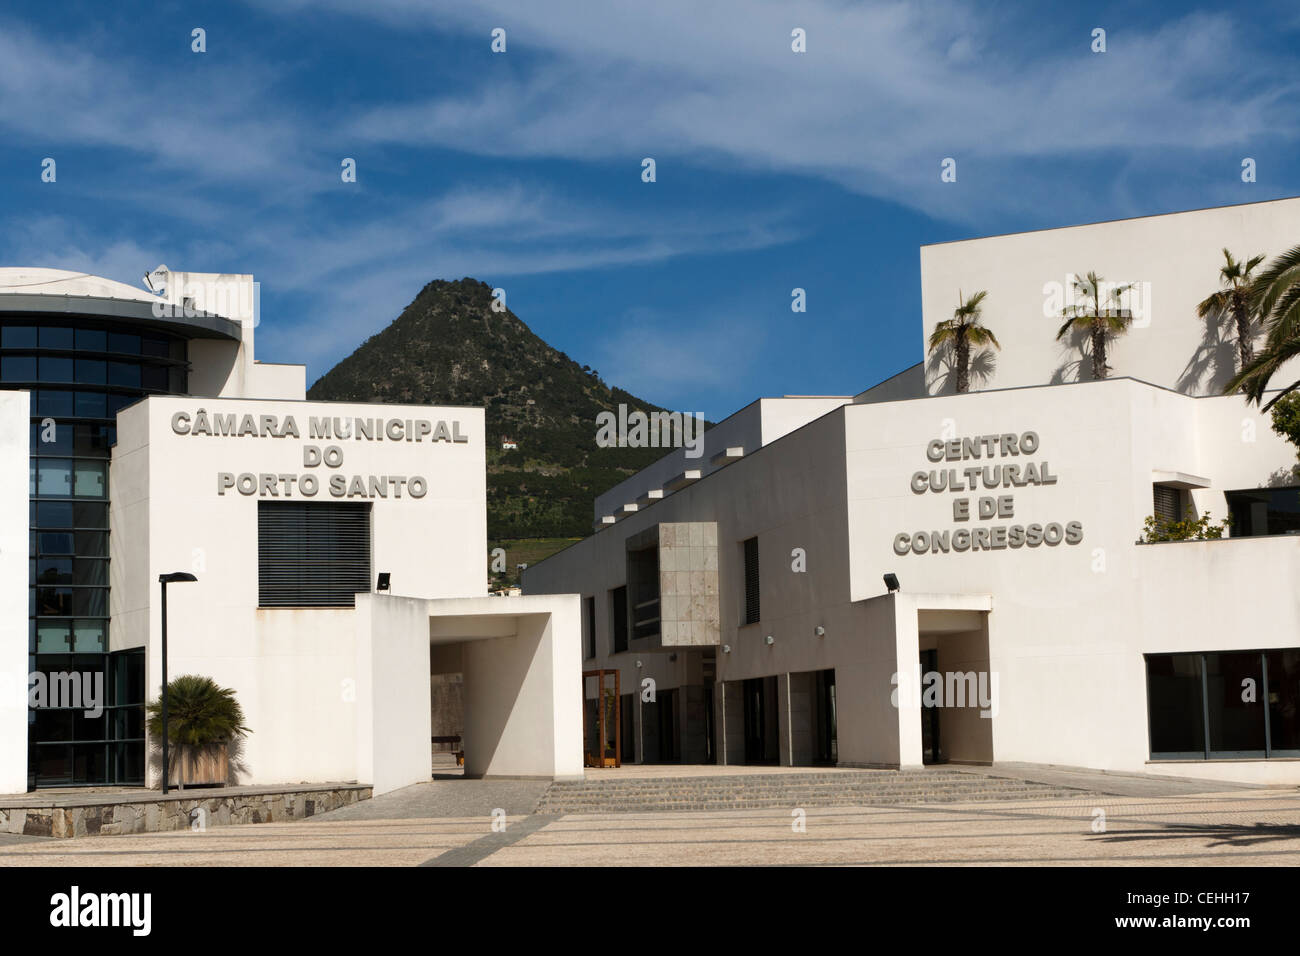 Camara de Municipal Porto Santo, Portugal - Stock Image